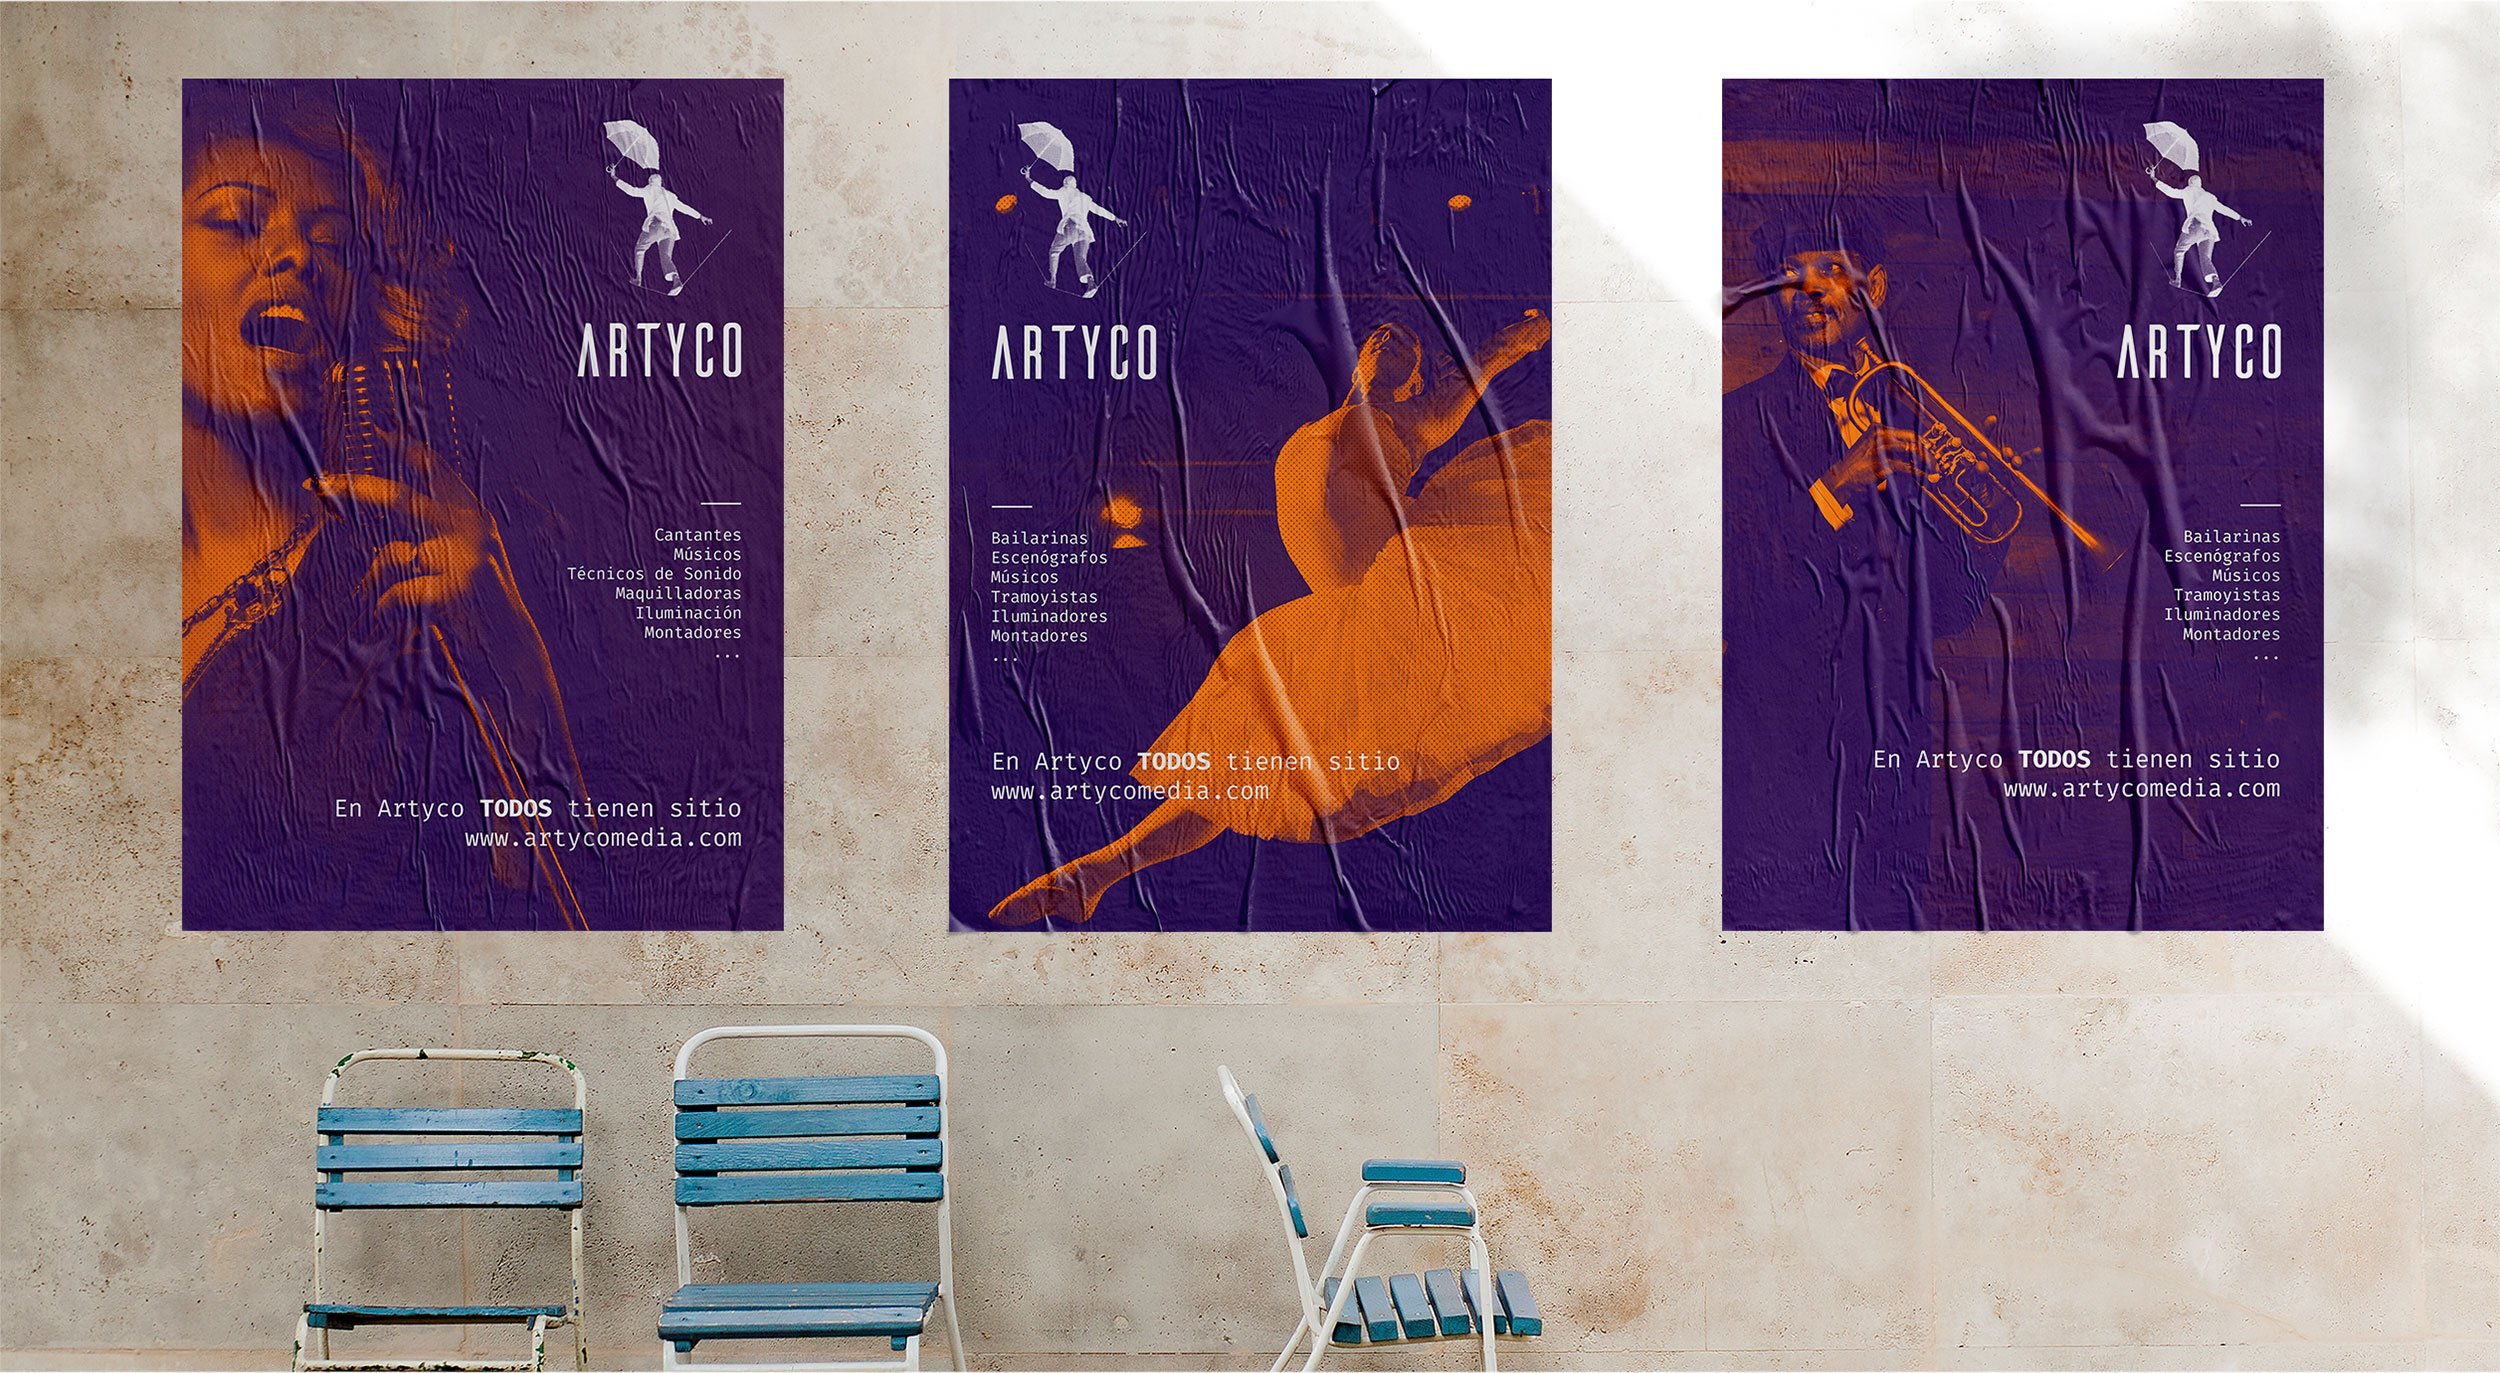 diseño-poster-artyco-agencia-adhoc